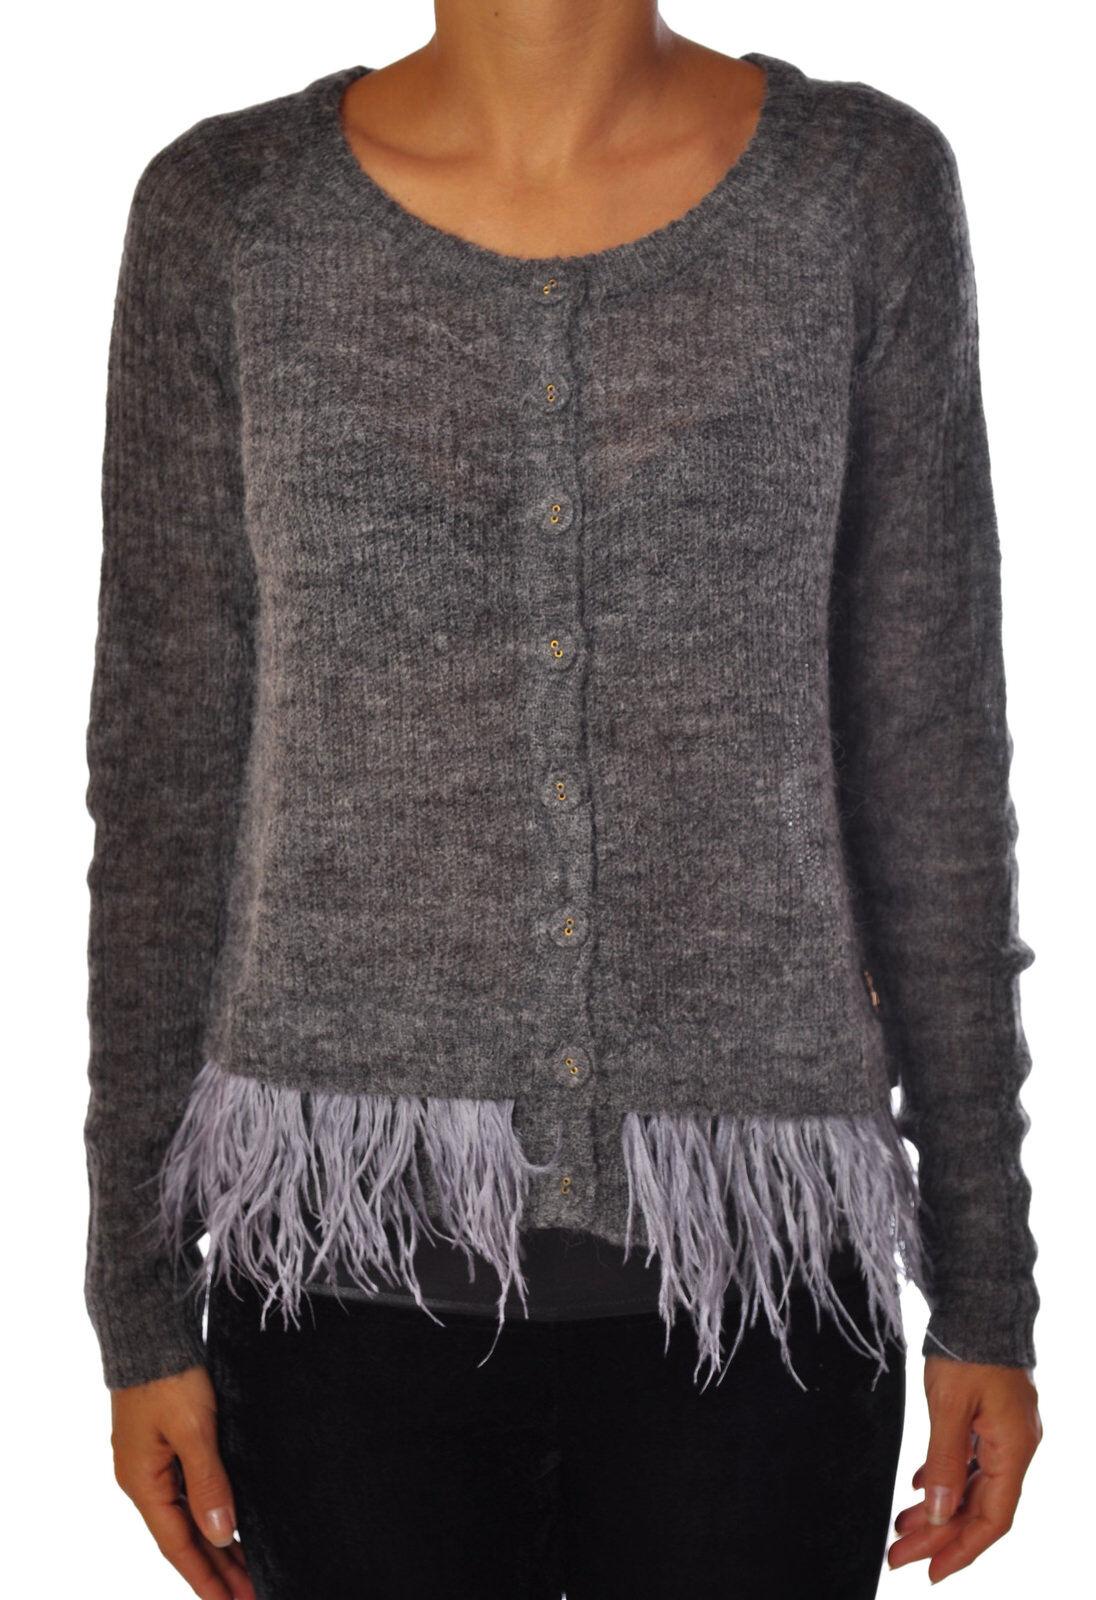 Patrizia Pepe - Knitwear-Cardigan - Woman - grau - 860018C183907